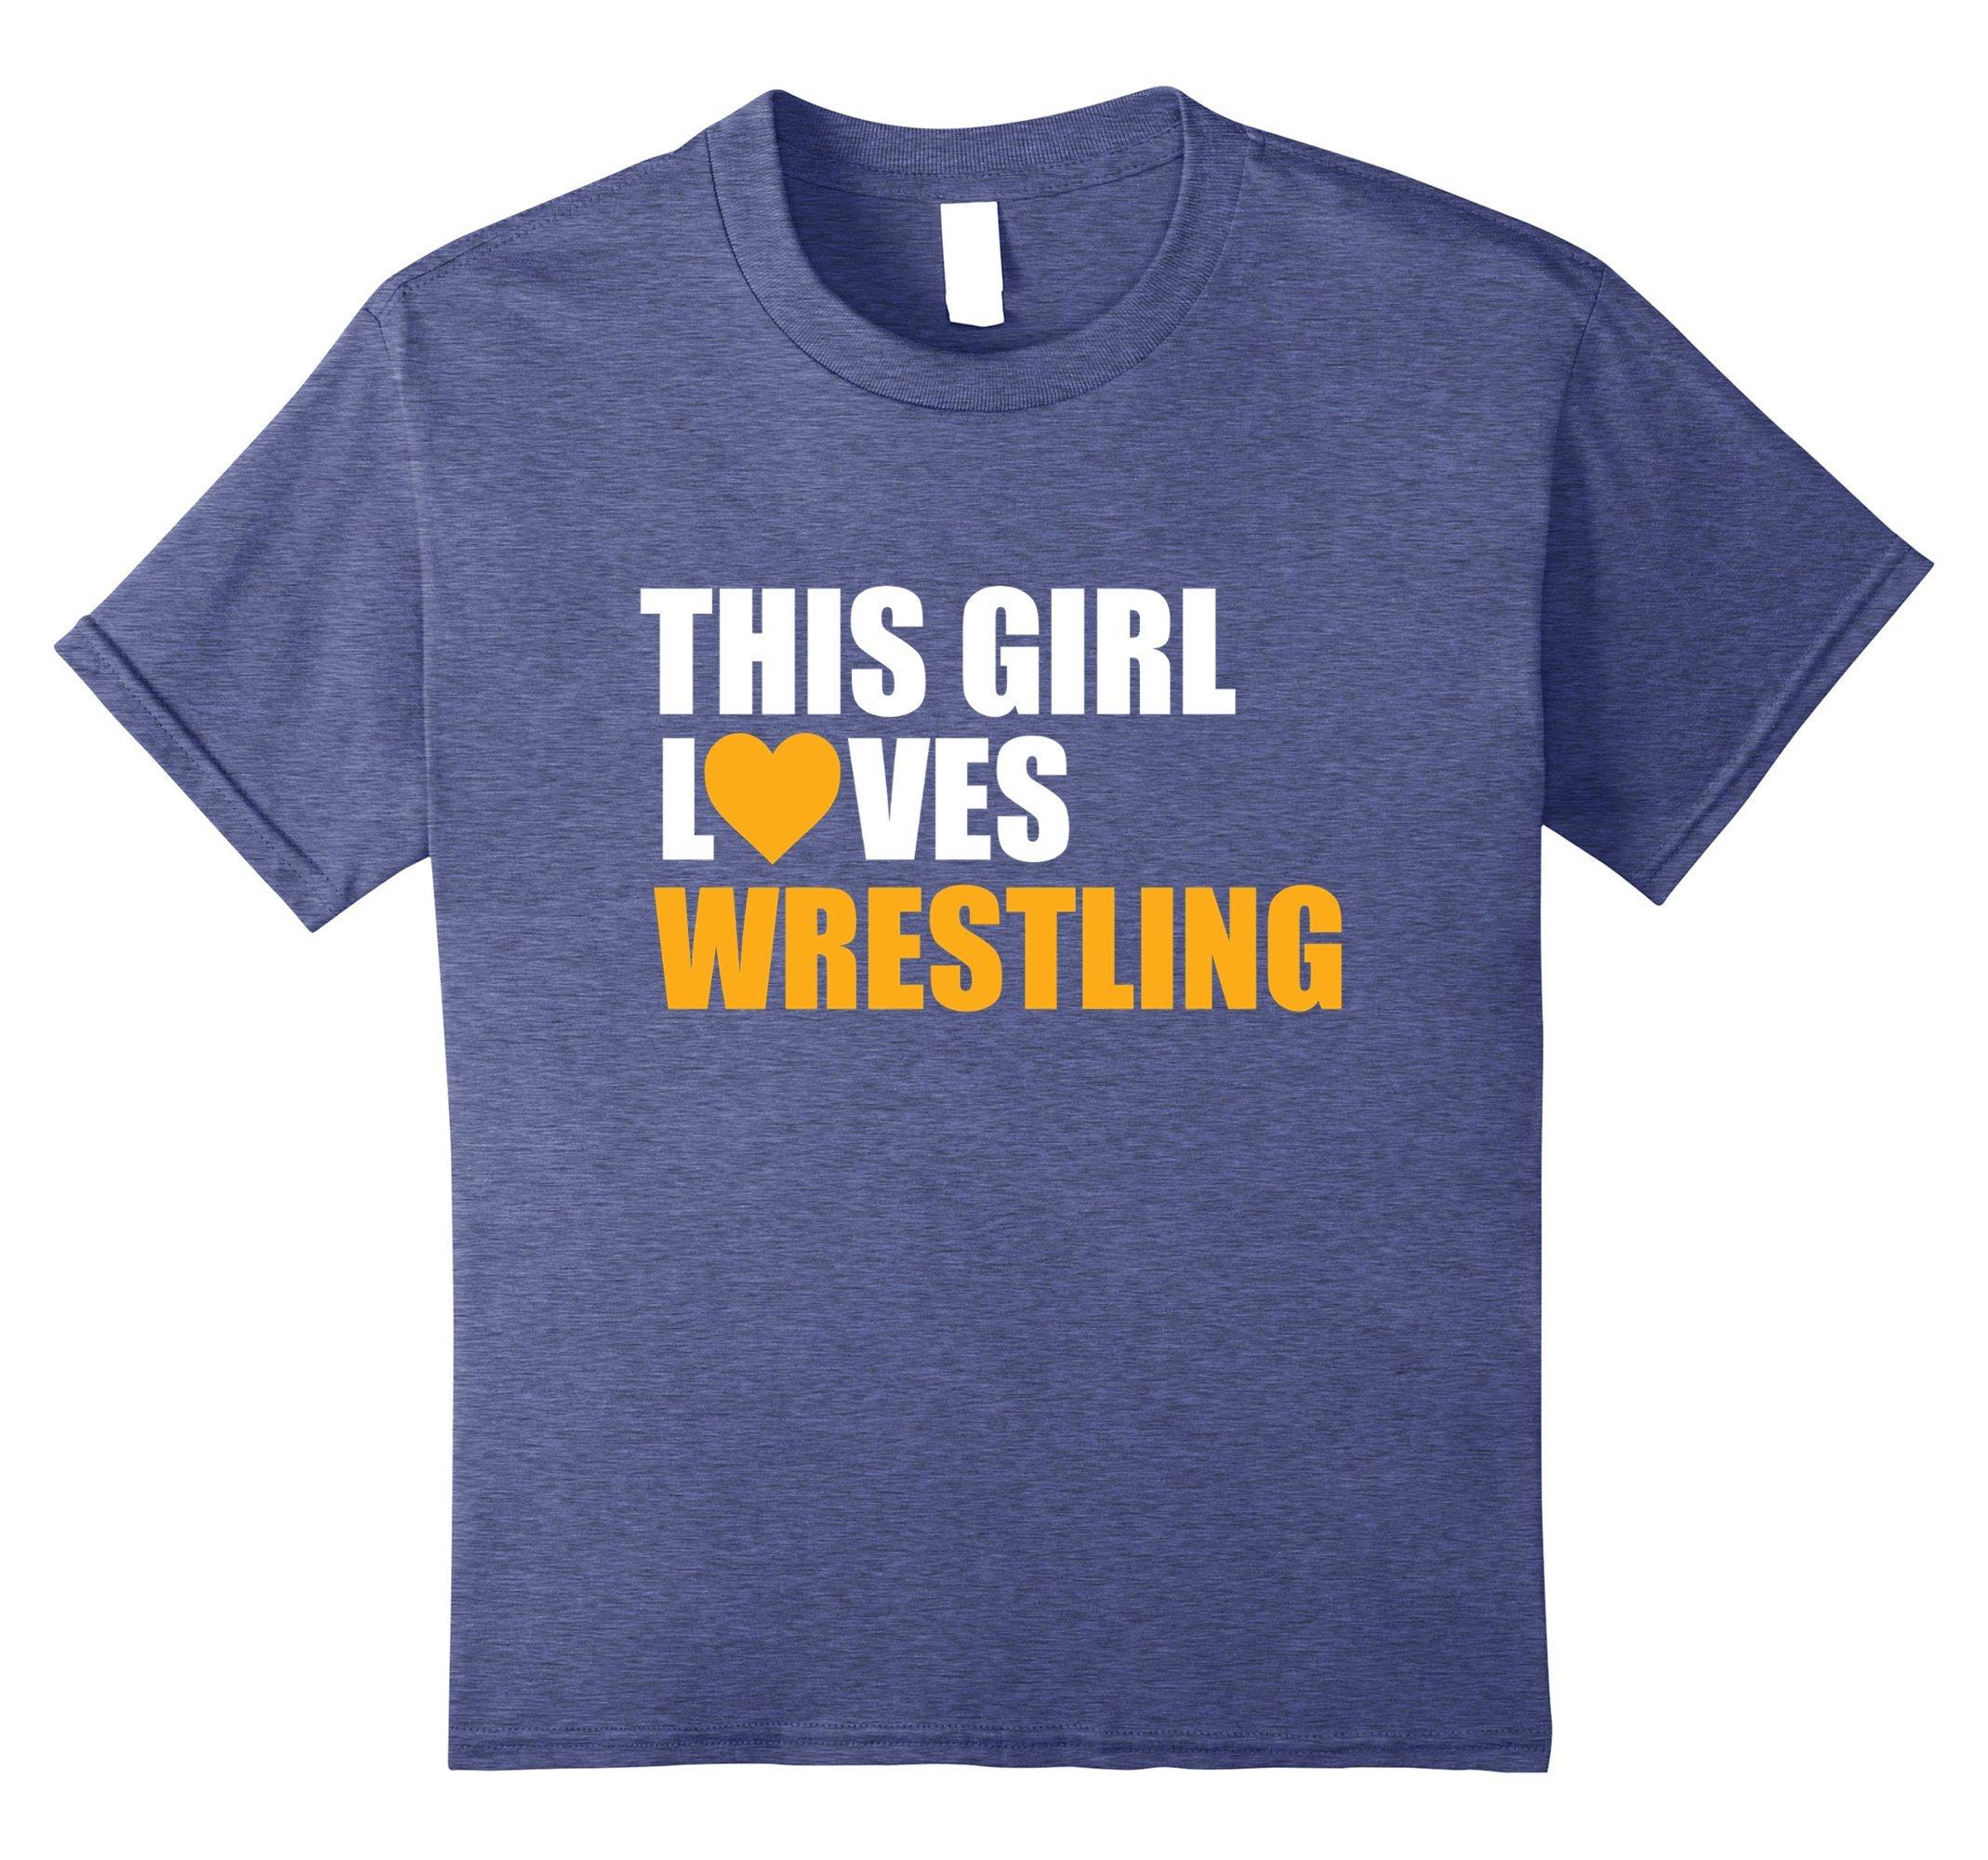 Kids Funny Wrestling Shirt This girl love wrestling 12 Heather Blue